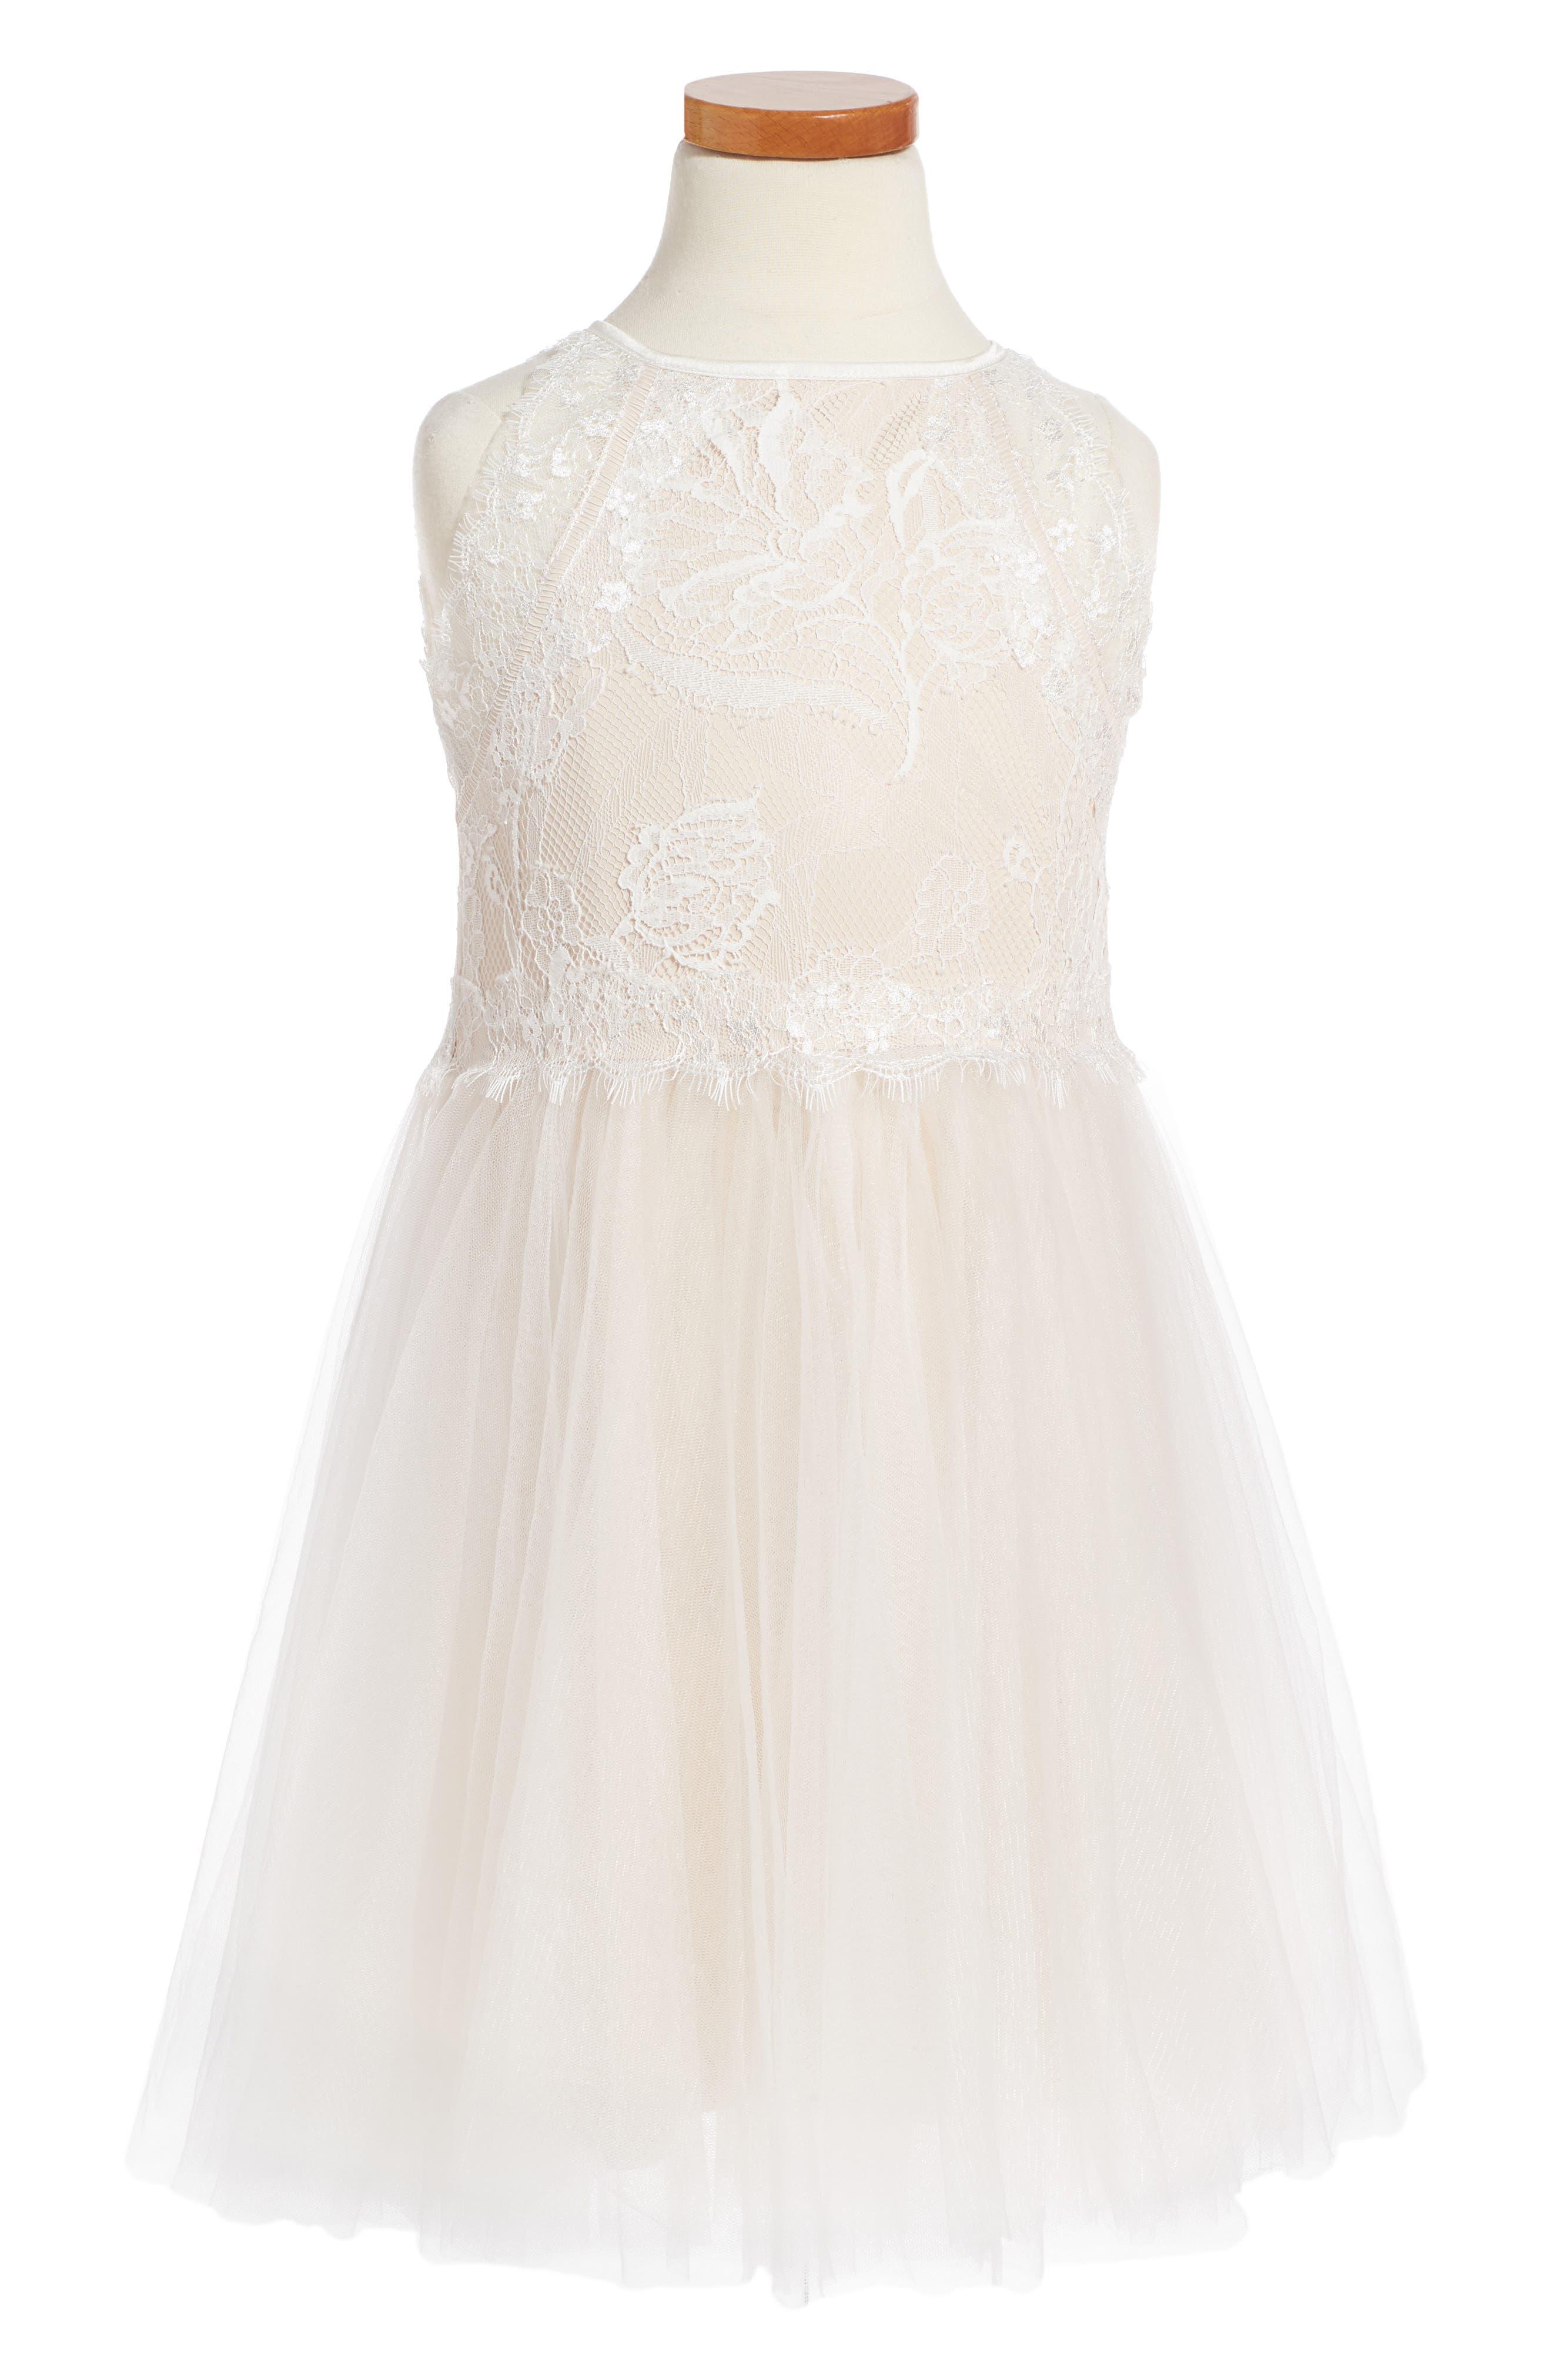 Sleeveless Lace Dress,                             Main thumbnail 1, color,                             900